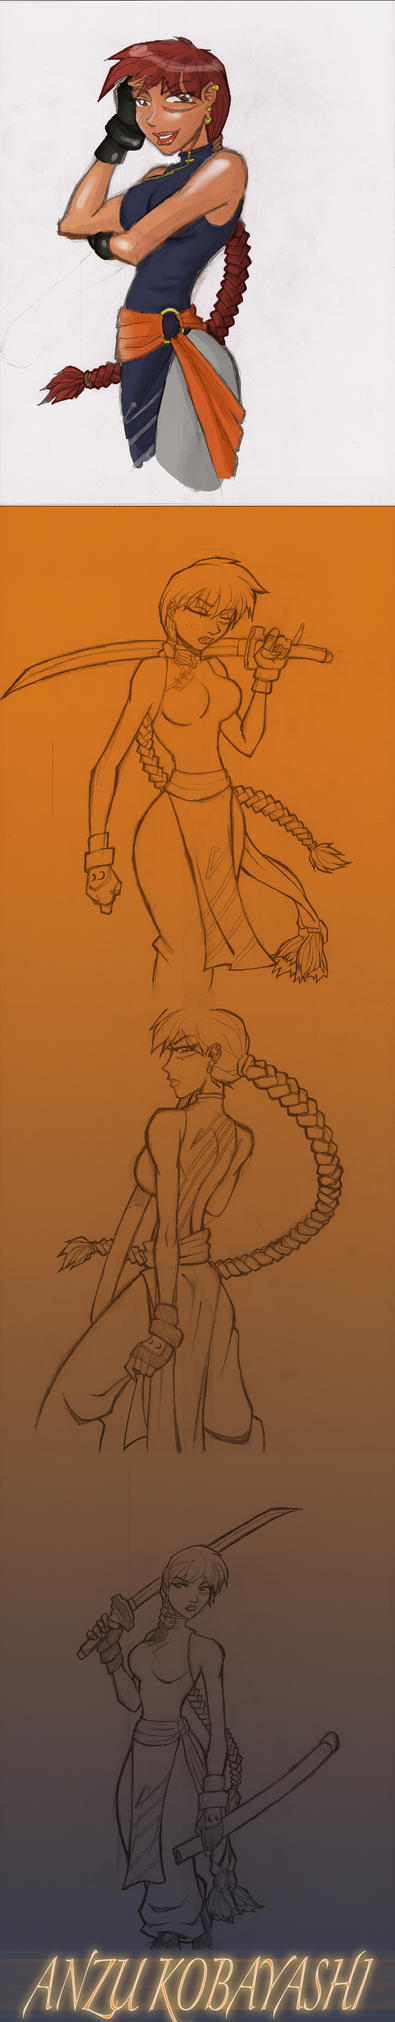 SakuraBowl Anzu by Ransak-the-Reject